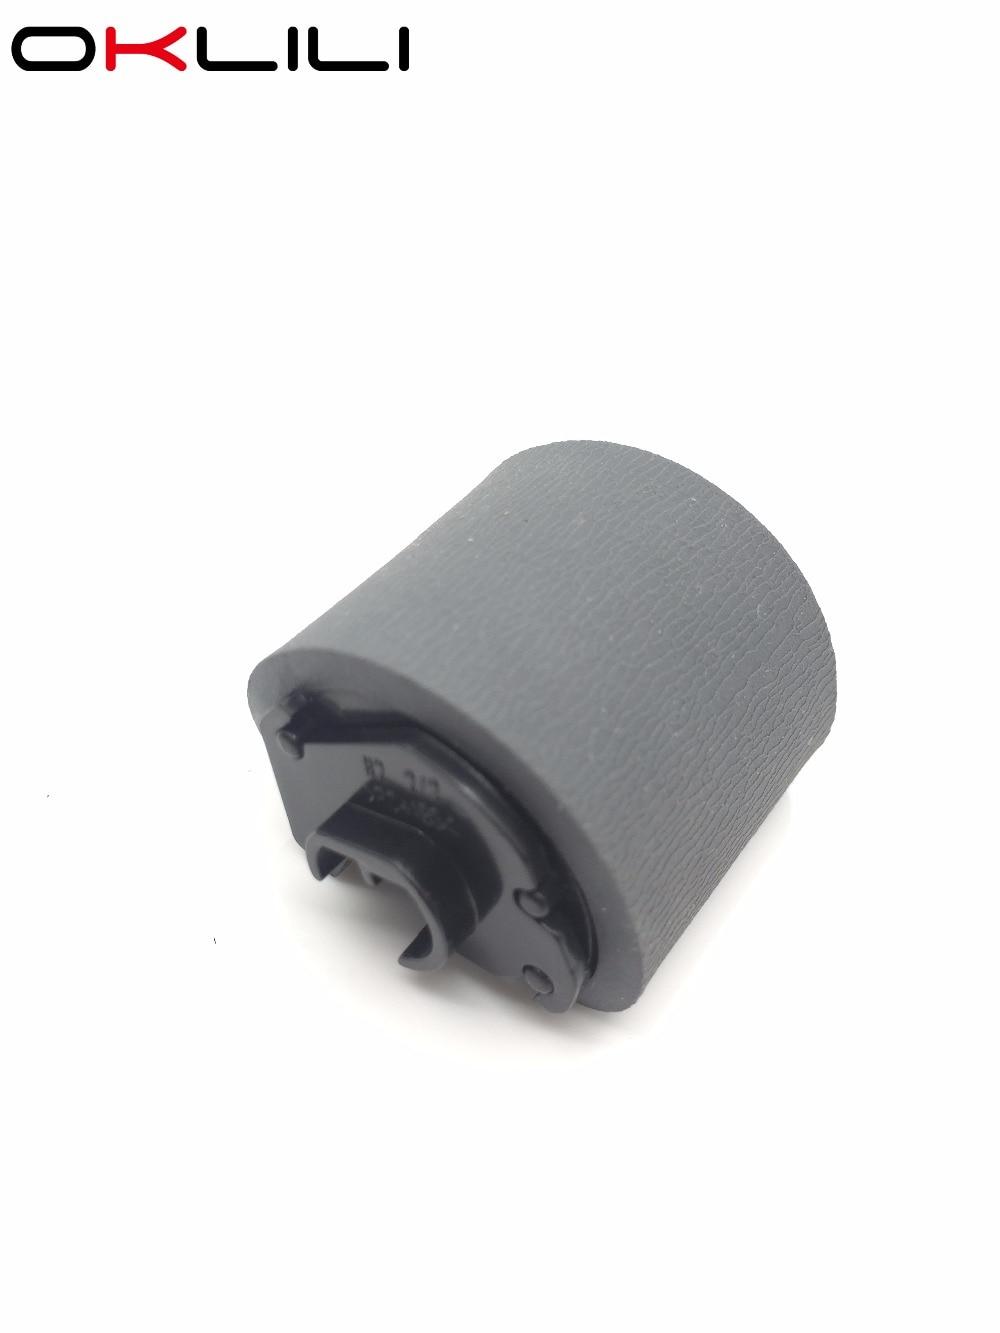 ORIGINAL NEW JC73-00239A Paper Pickup Roller for Samsung ML2510 ML2570 ML2571 SCX-4725 SCX4725 for Xerox Phaser 3200 1pcs pickup roller for xerox pe220 3200 for samsung 4521f 4321 4725 copier parts